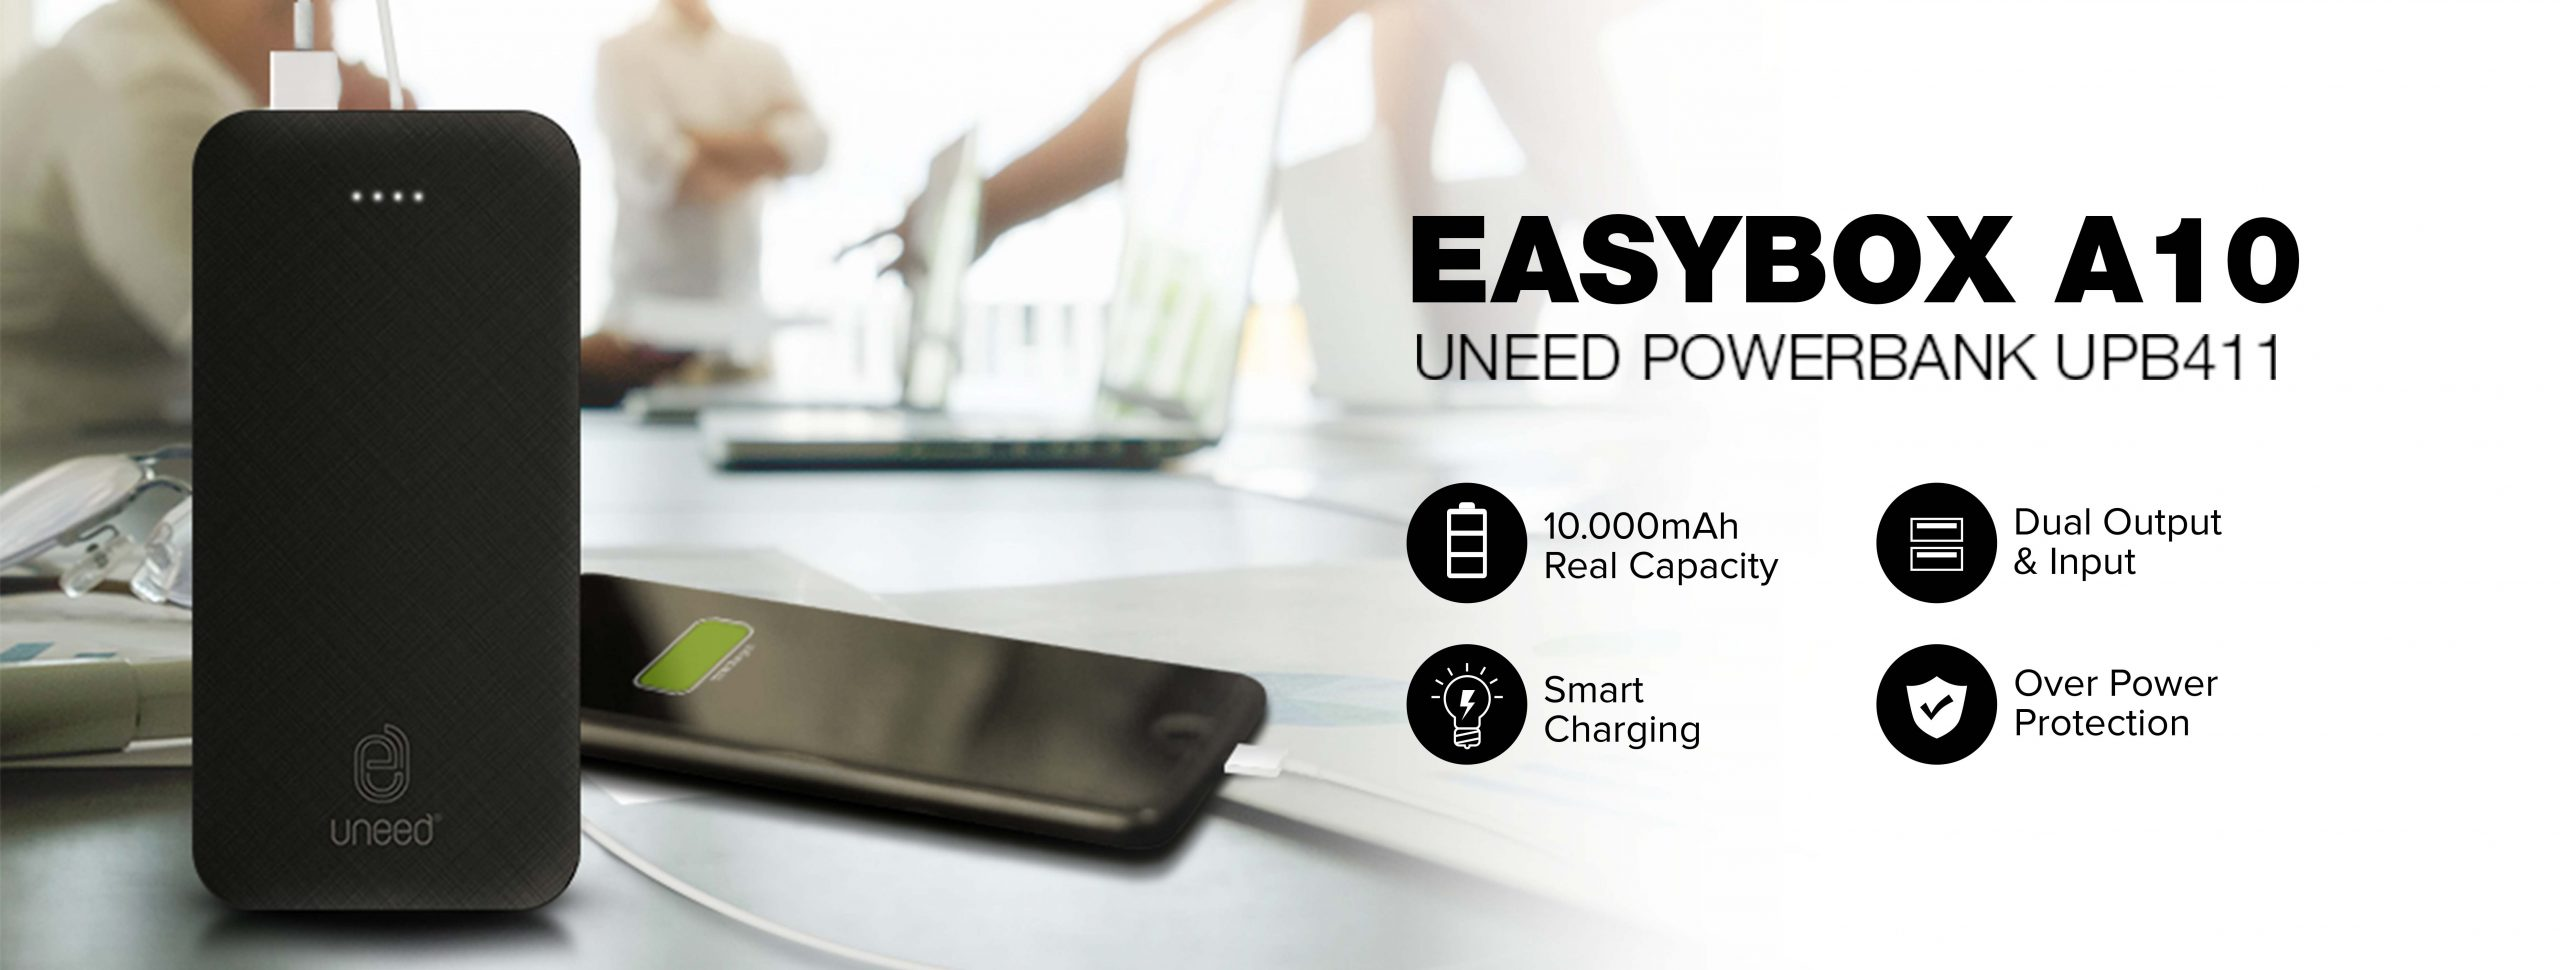 Uneed Powerbank Easybox A10